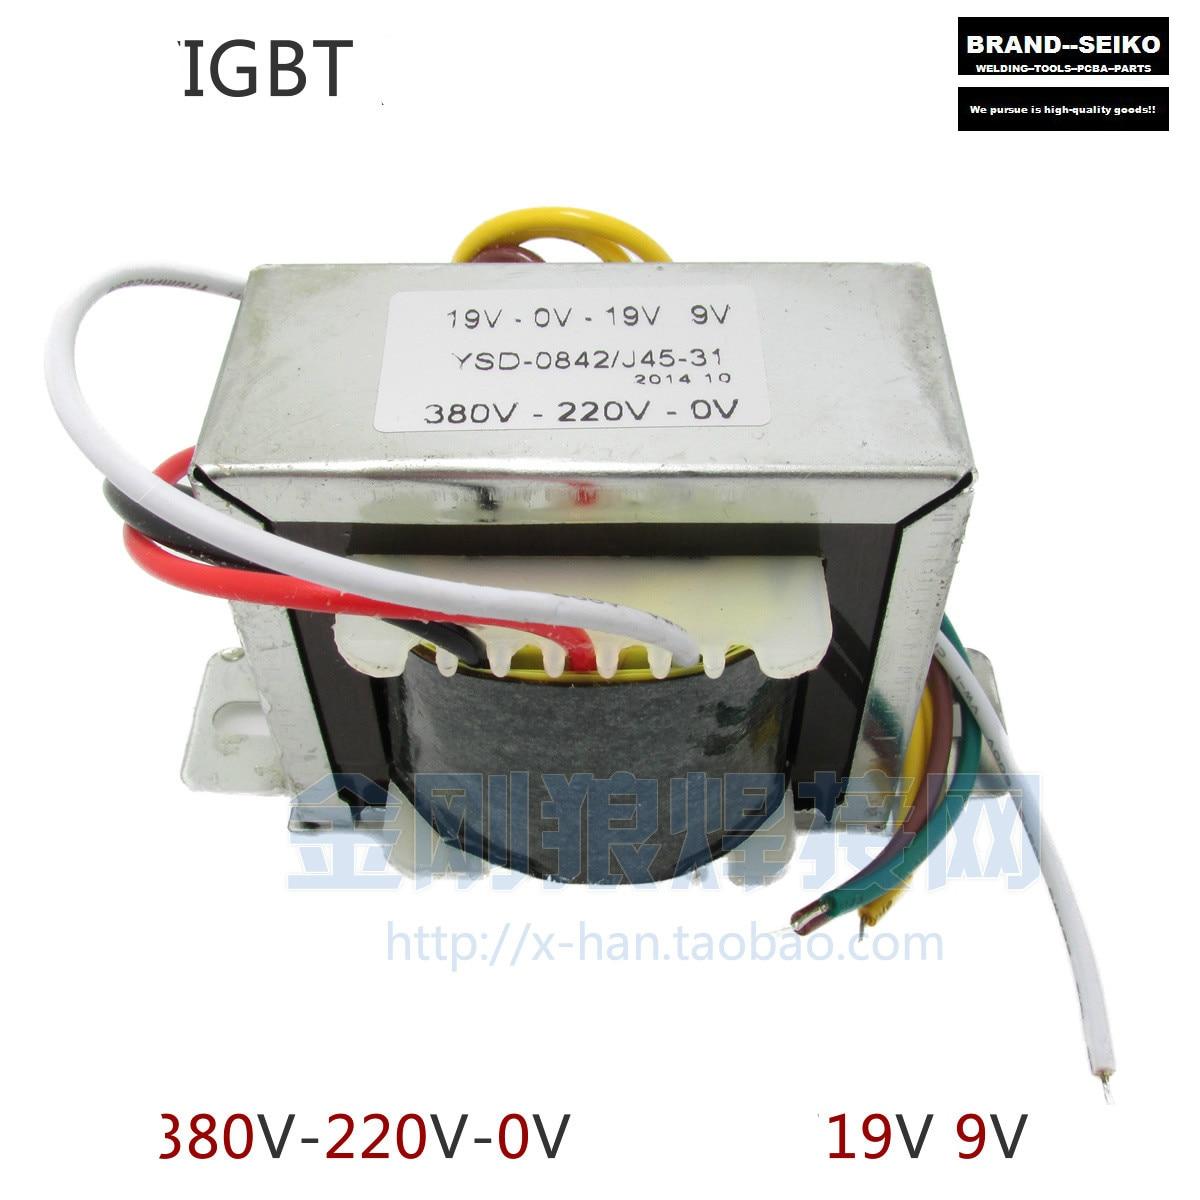 Single Igbt Double 19v Inverter Transformer 19v-0-19v 9v Input 0-220v-380v 0 19